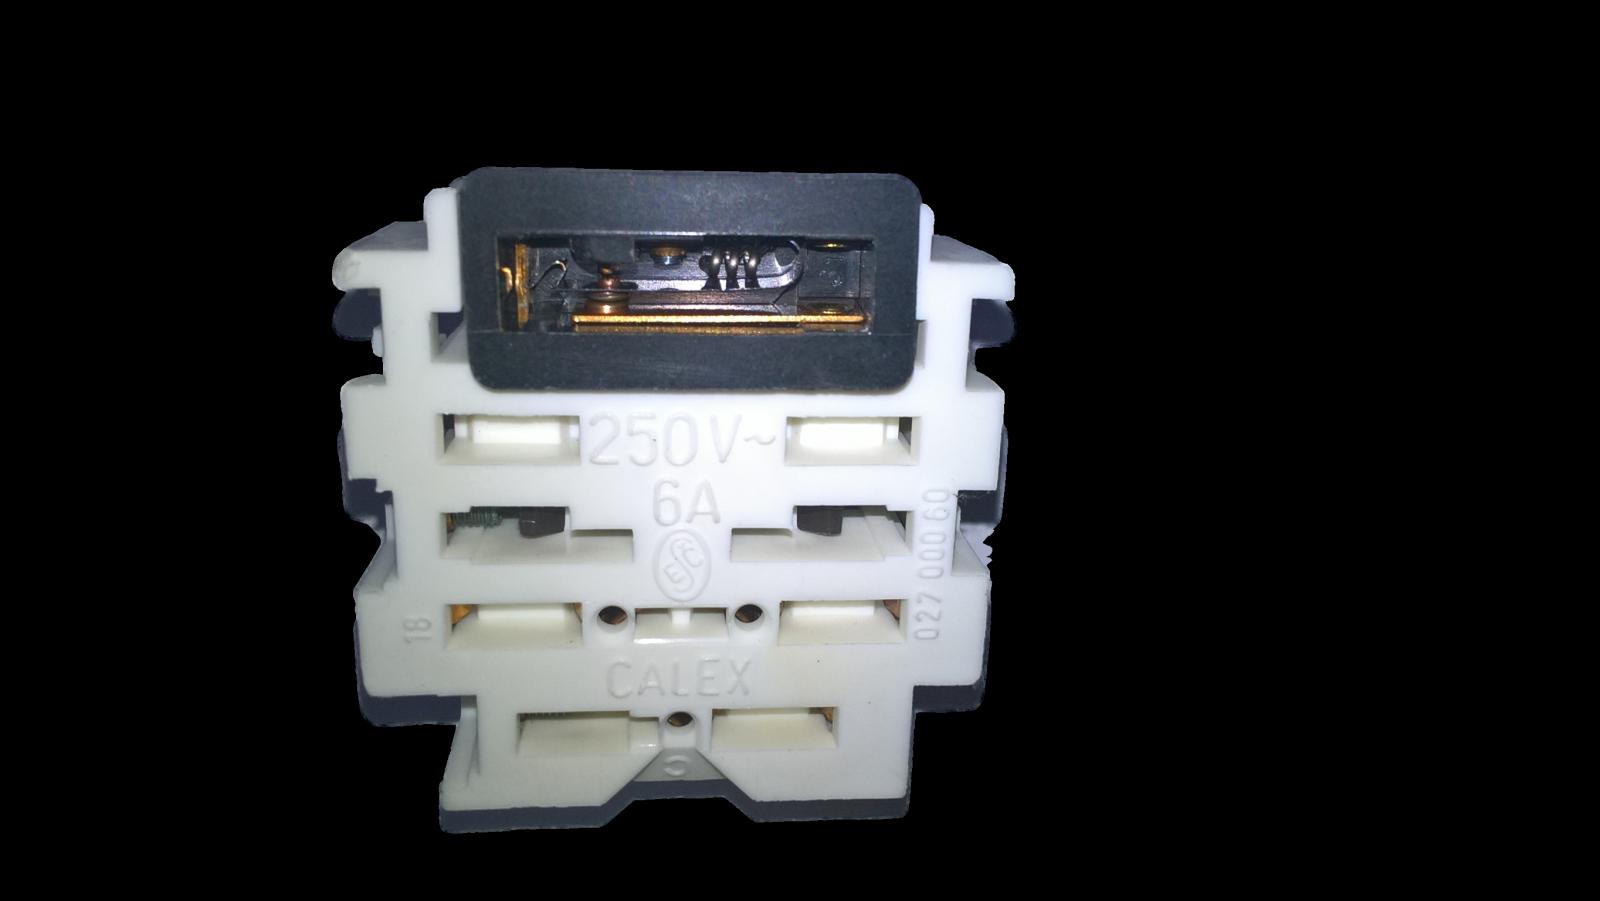 instalace kompresoru, relé mrazničky Calex Samsung